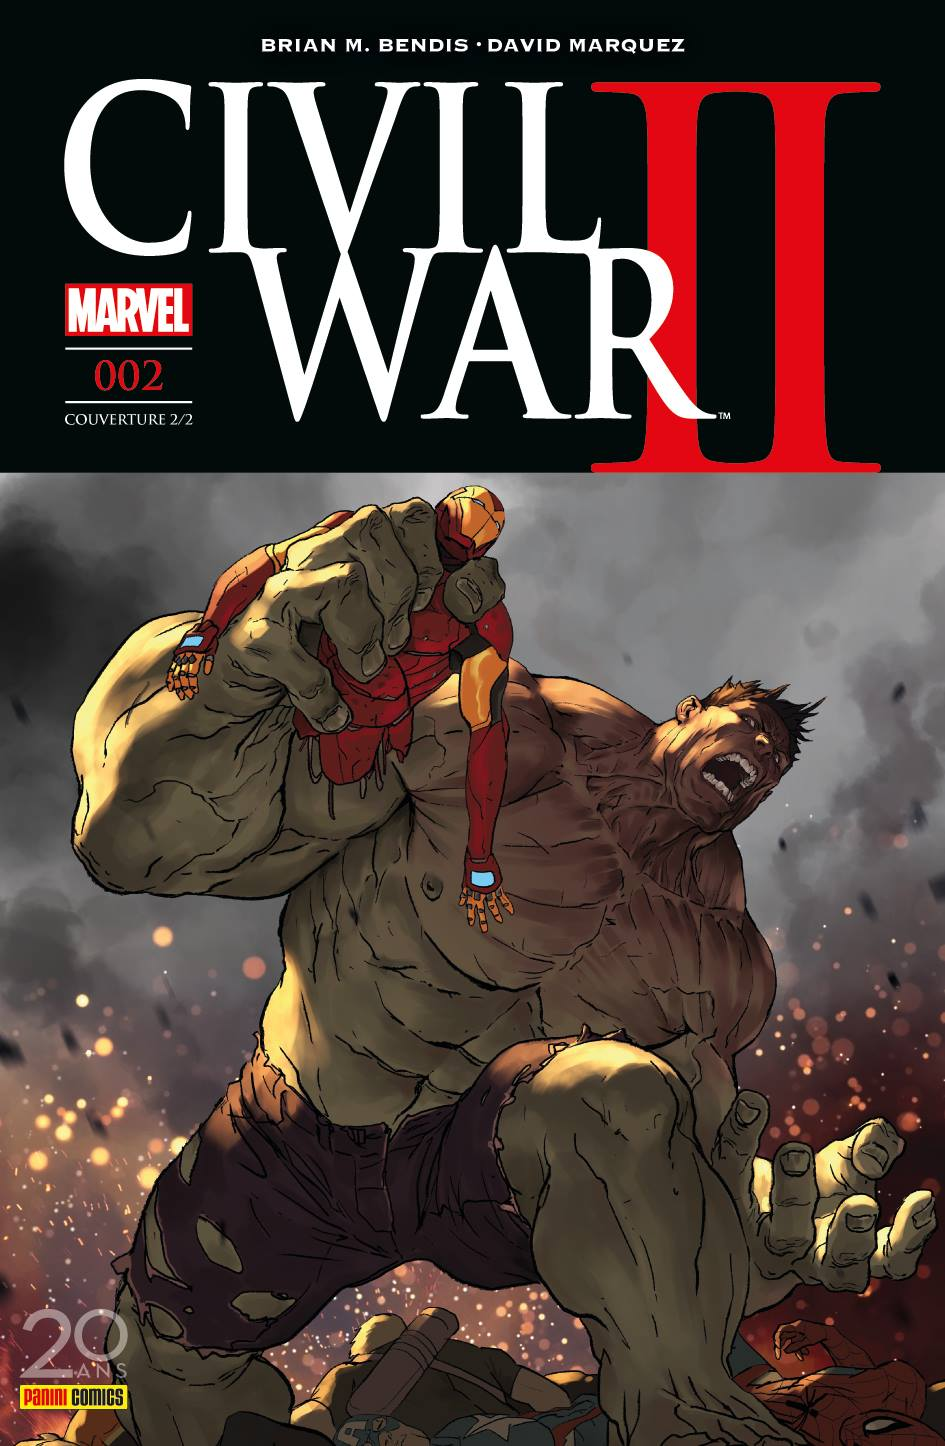 CIVIL WAR II 2 (Couv 2/2)